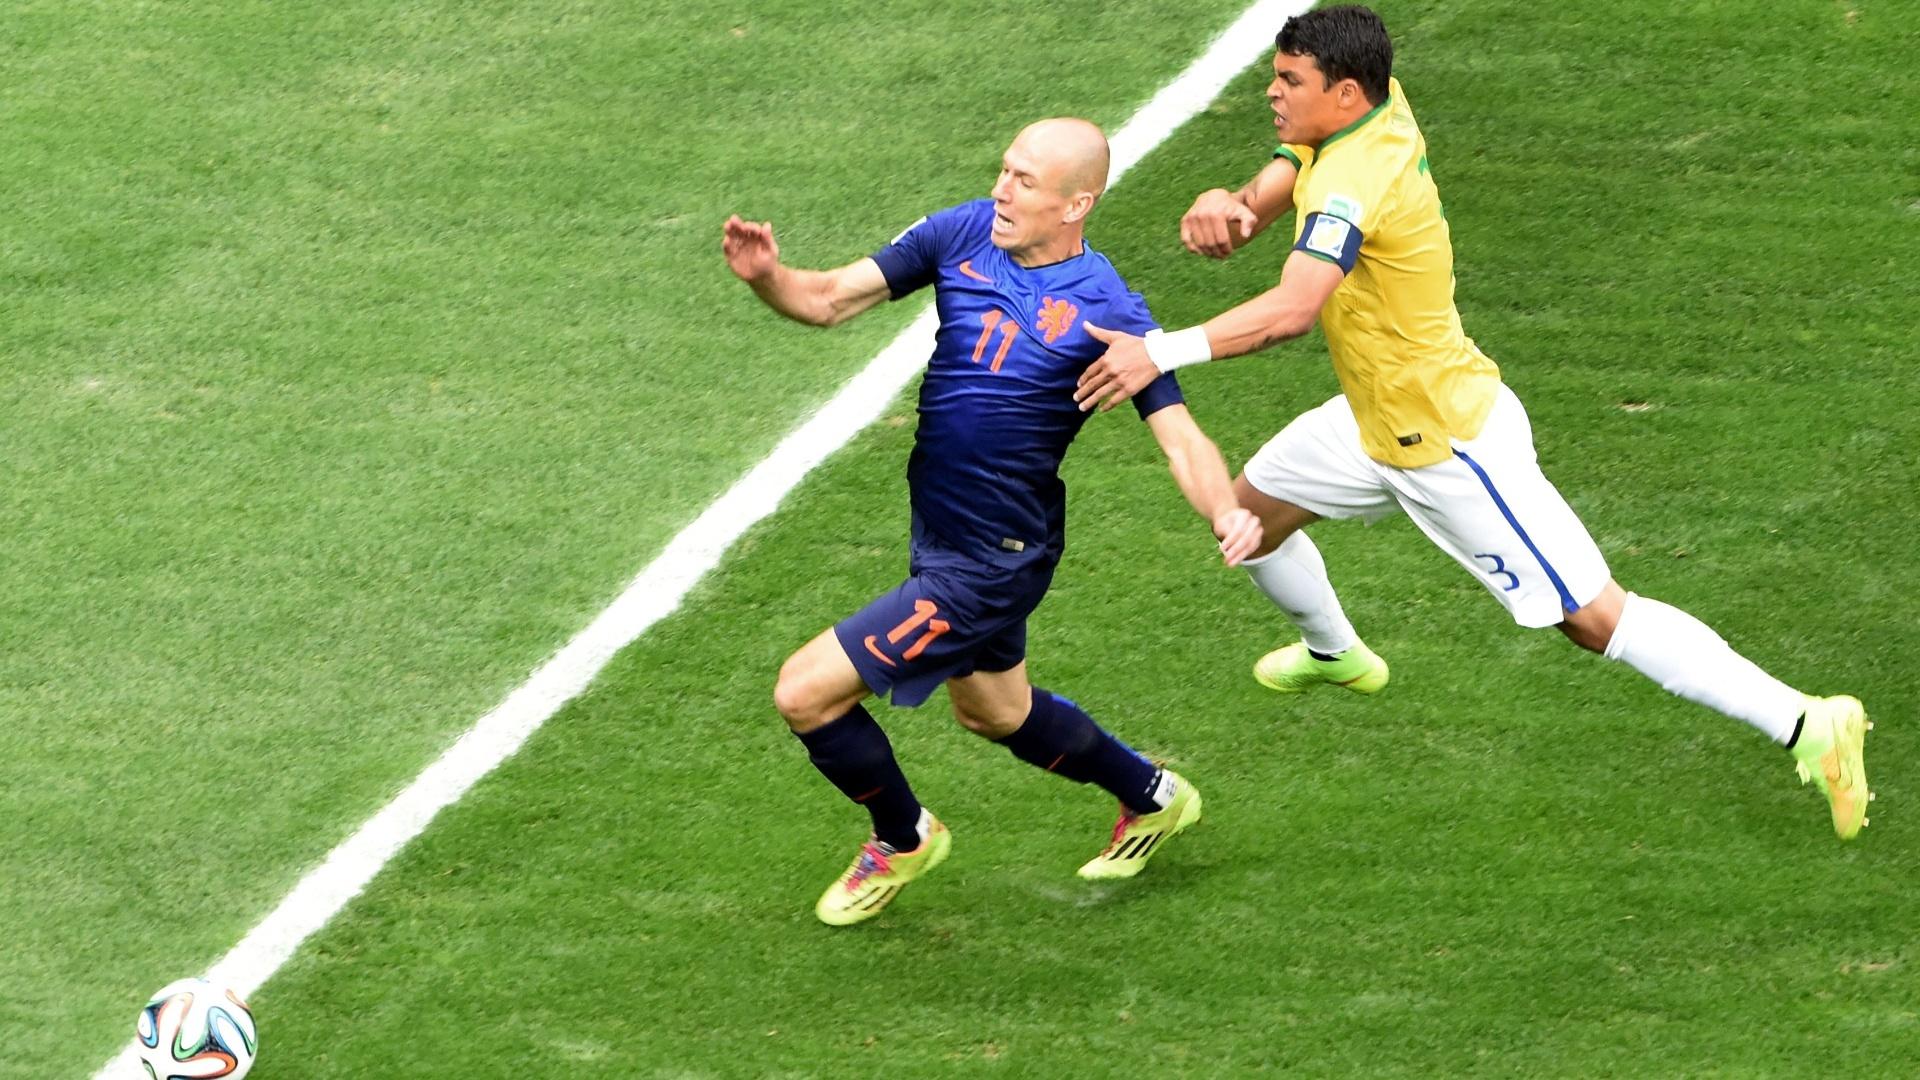 12.jul.2014 - Thiago Silva segura Robben e o árbitro marca pênalti a favor da Holanda, que saiu na frente do placar no Mané Garrincha